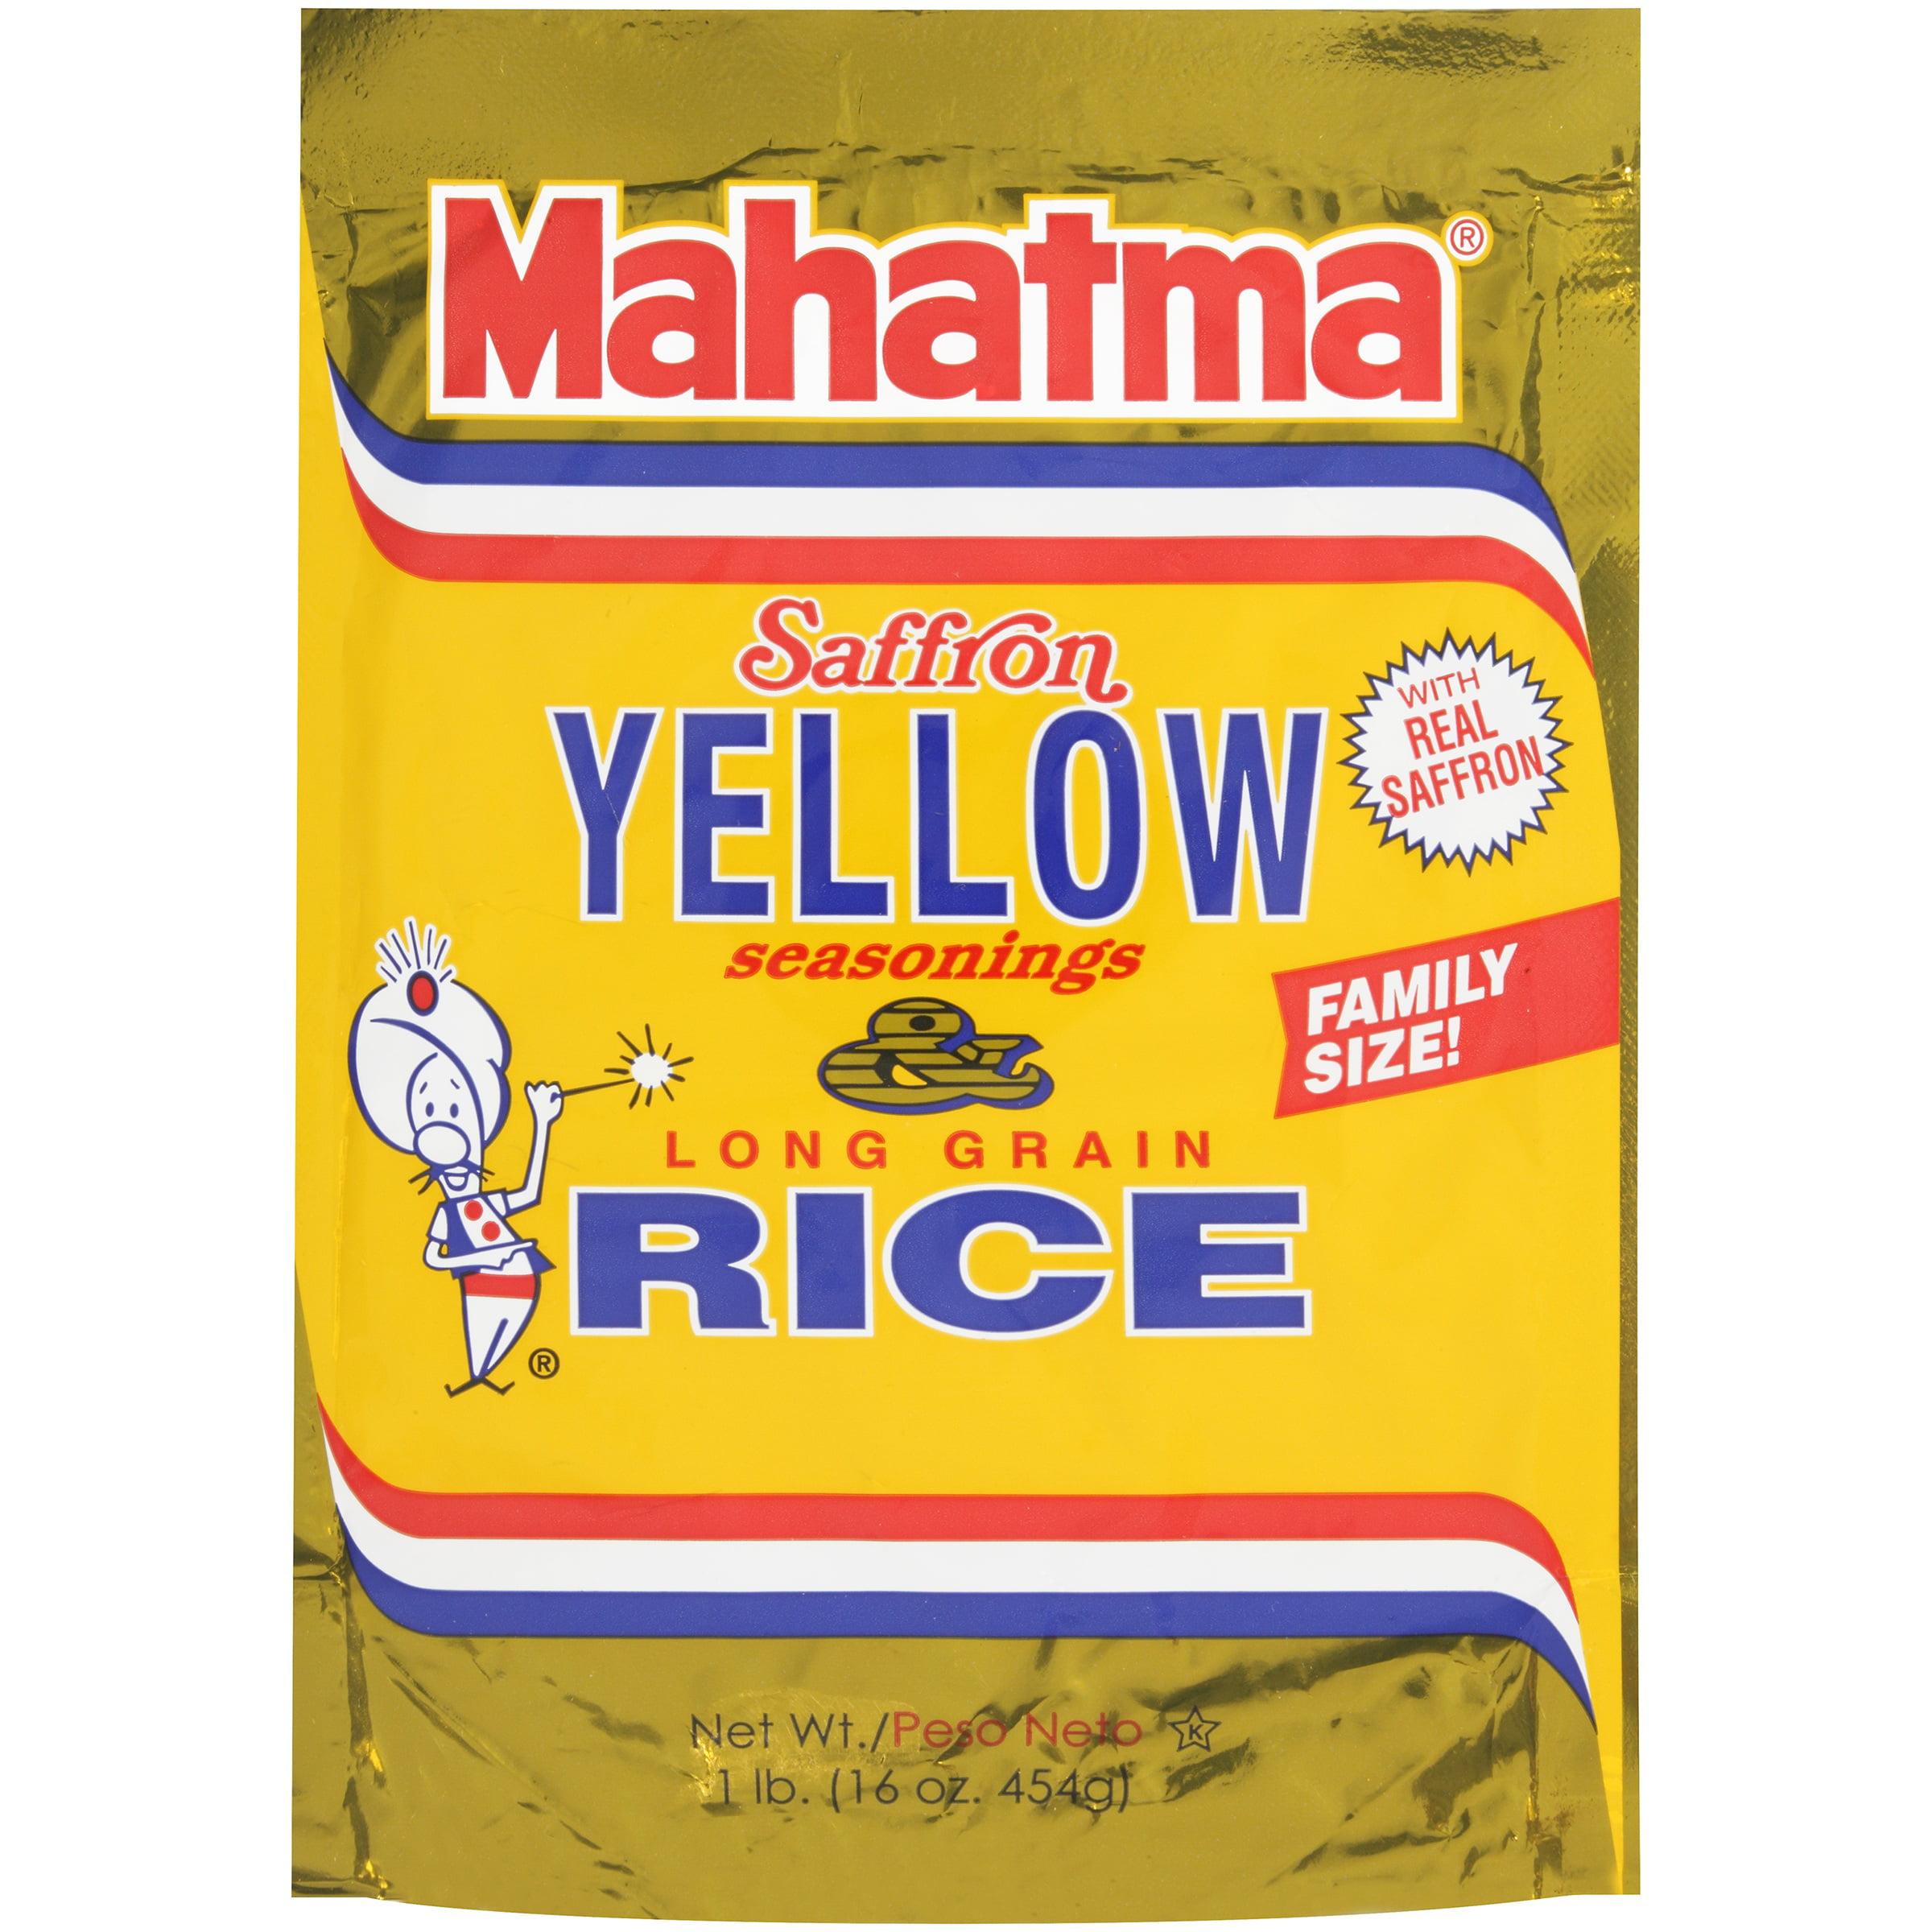 Mahatma Saffron Yellow Seasonings & Long Grain Rice 16 oz. Pouch by Riviana Foods Inc.